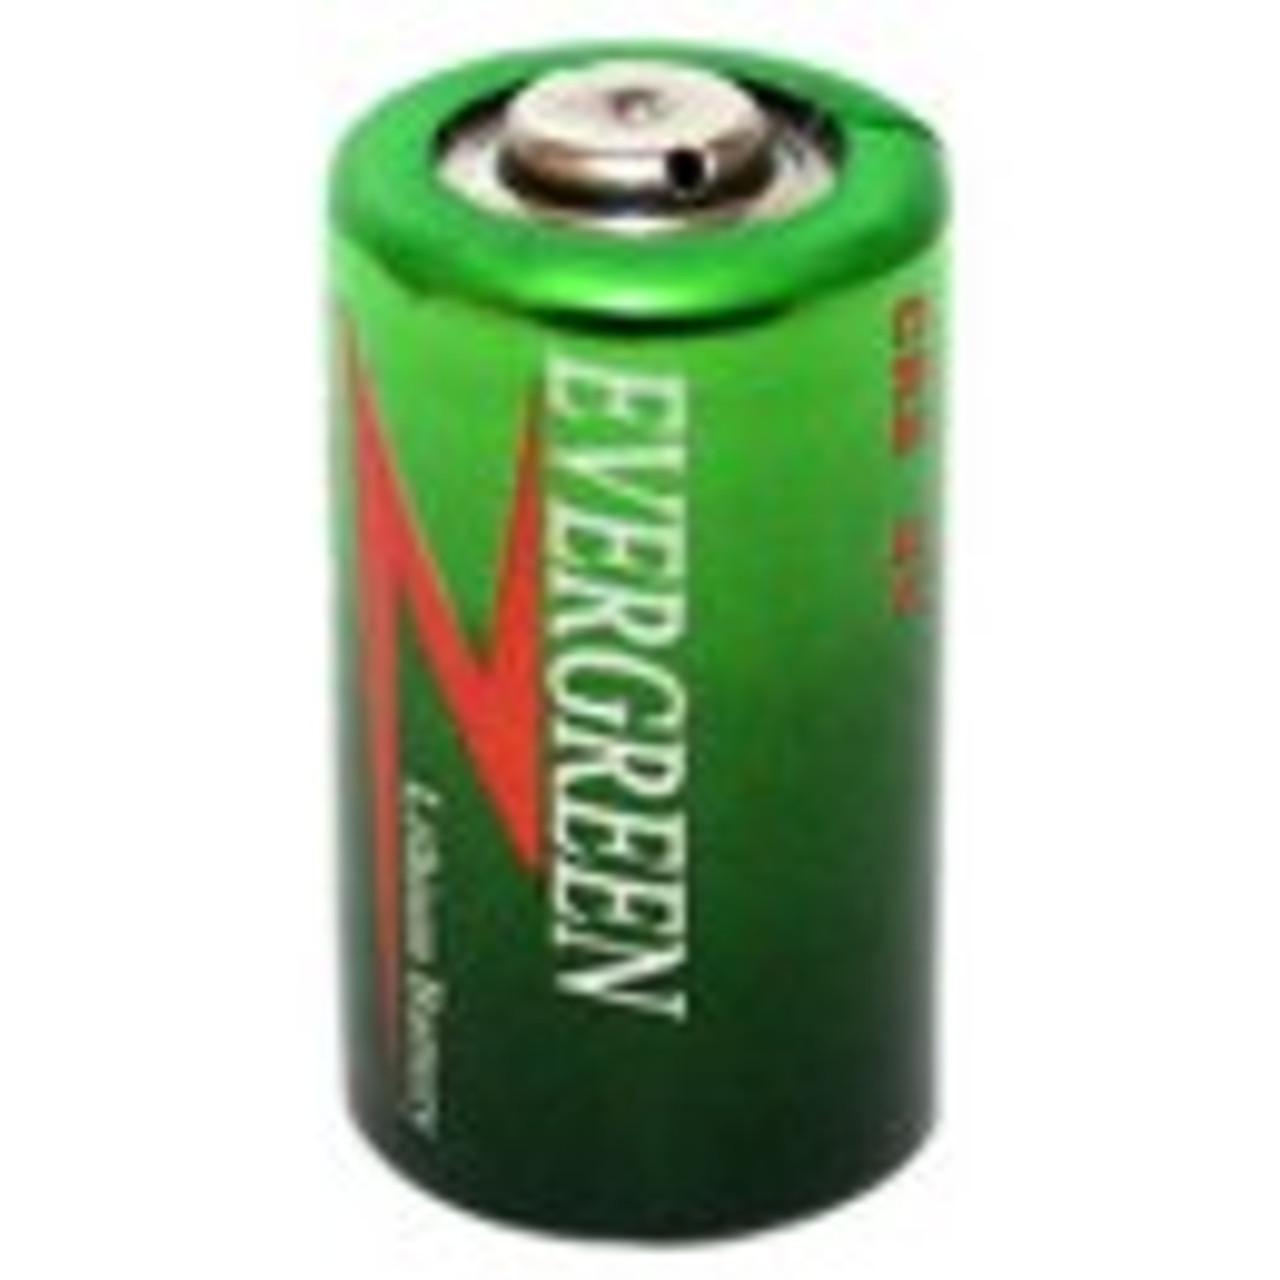 2/3A Lithium Battery CR123